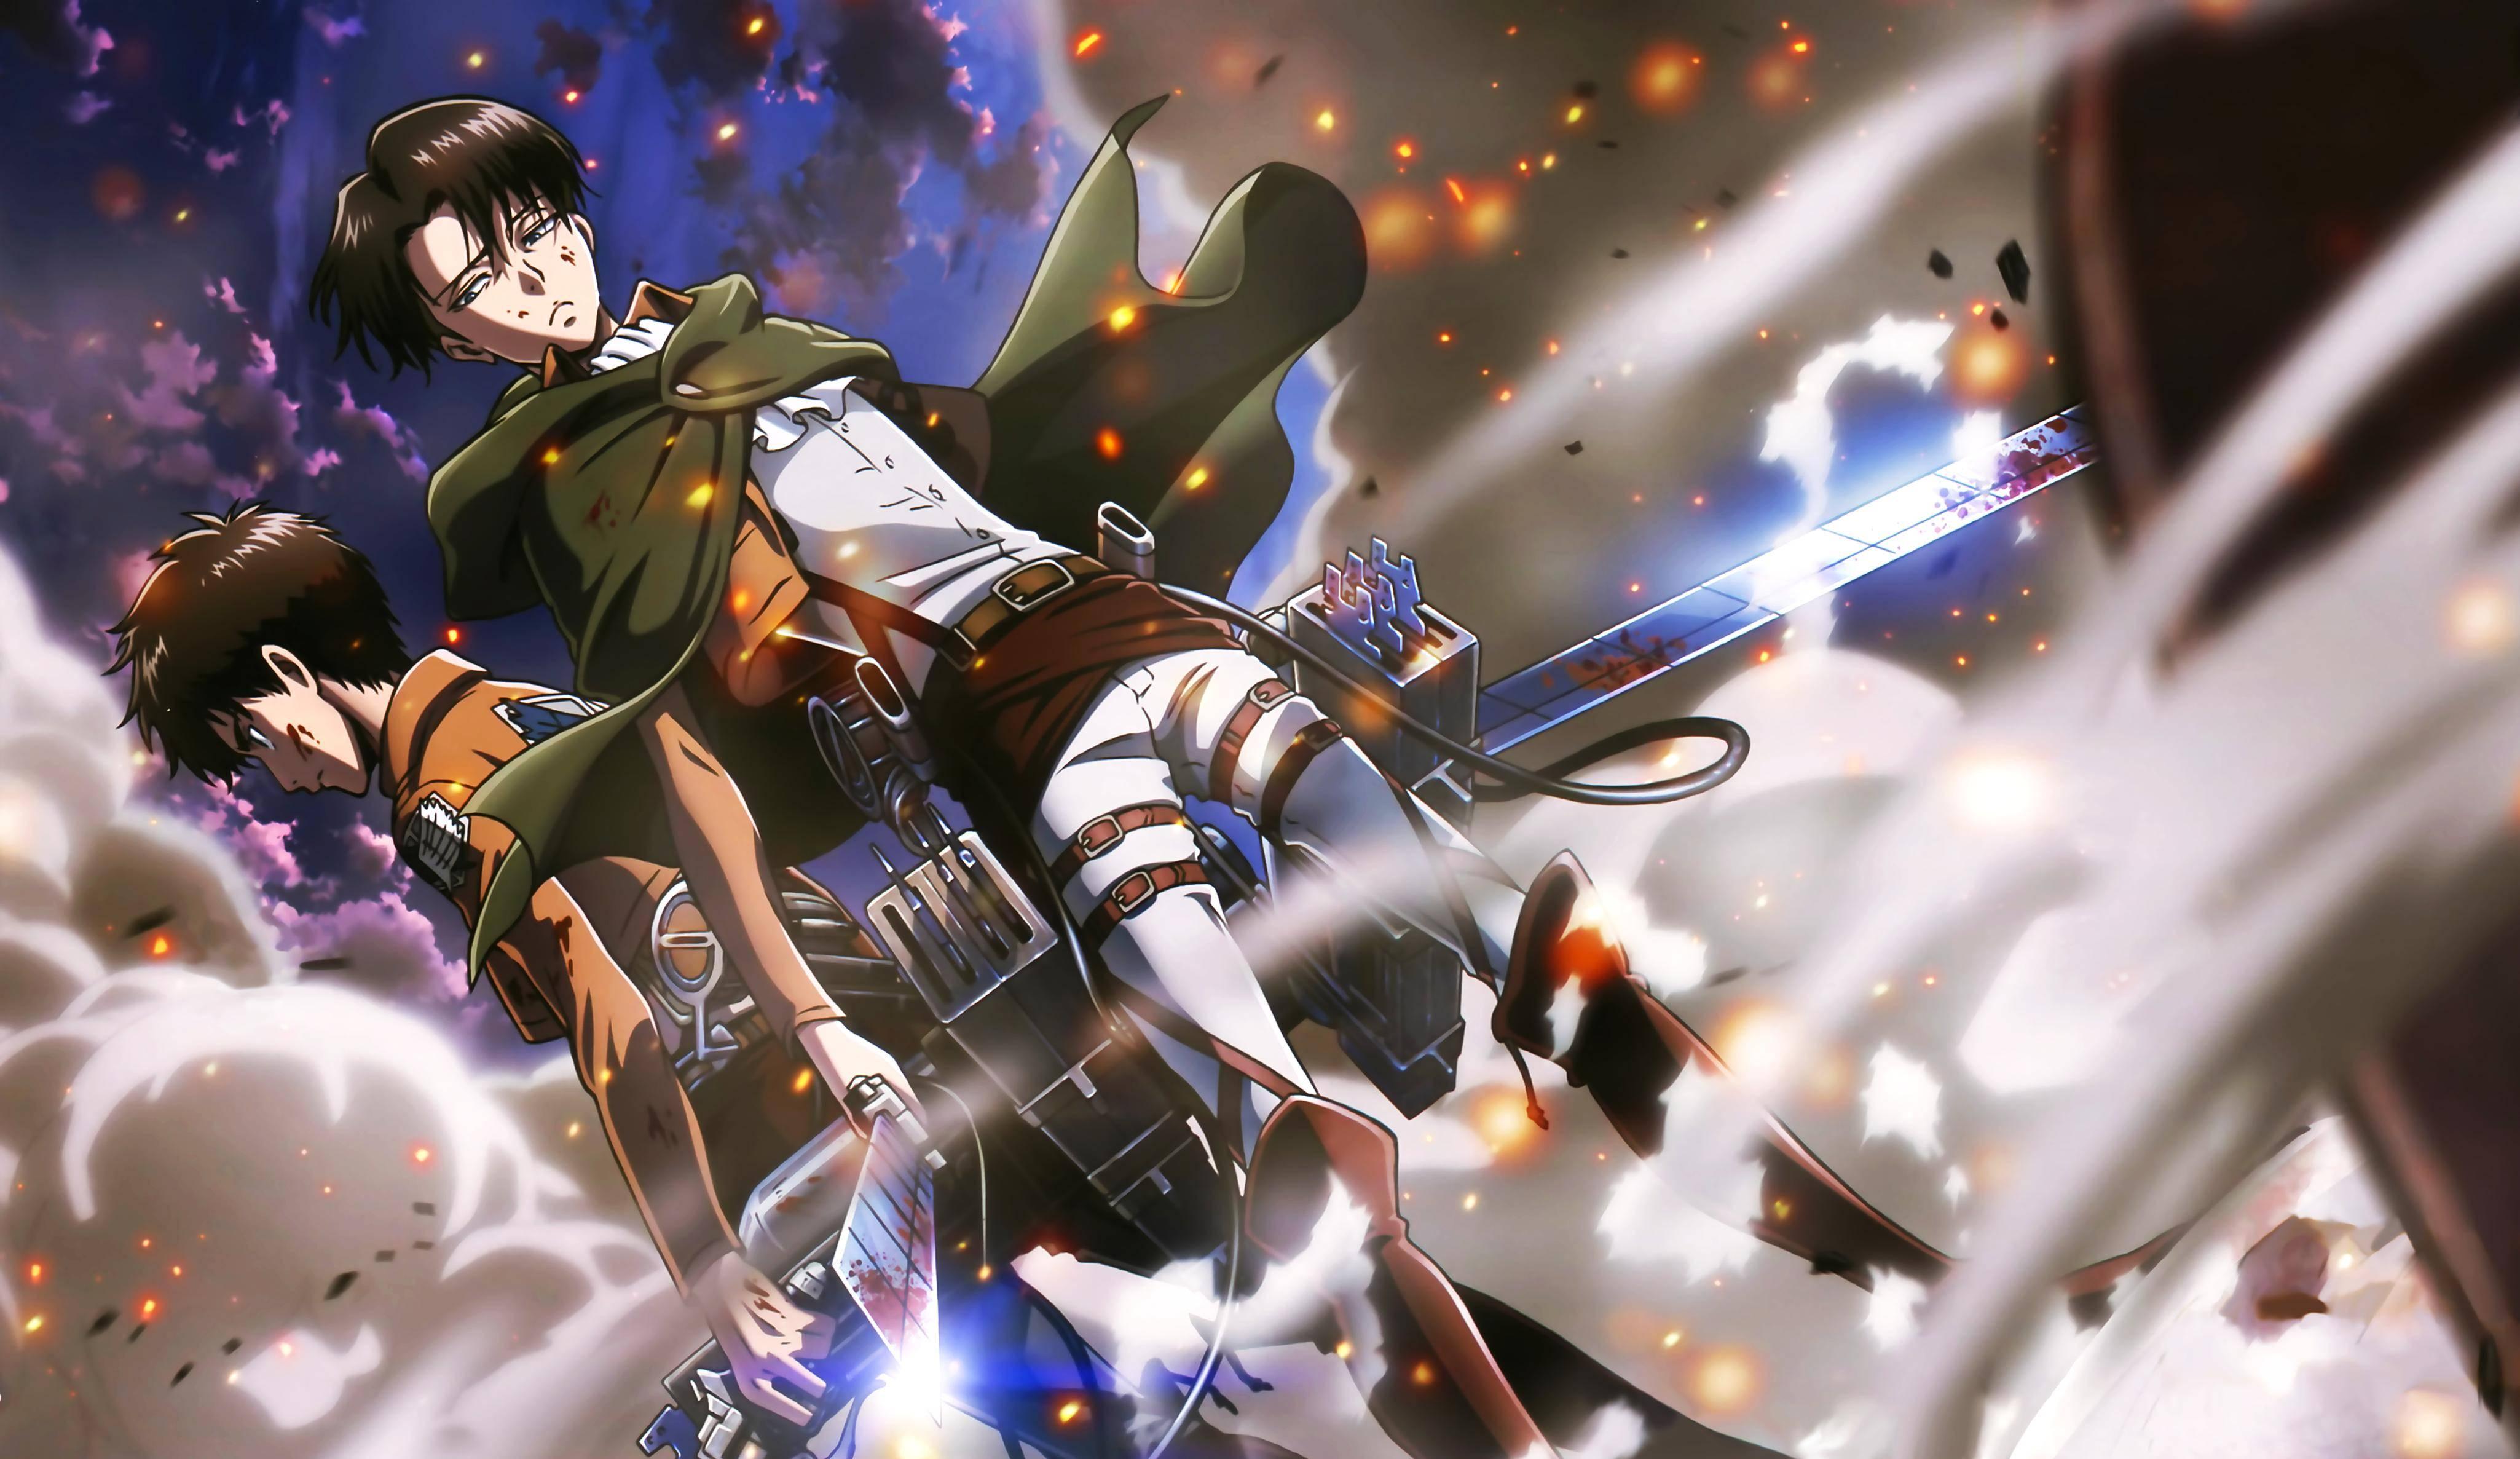 Attack on Titan wallpaper 9